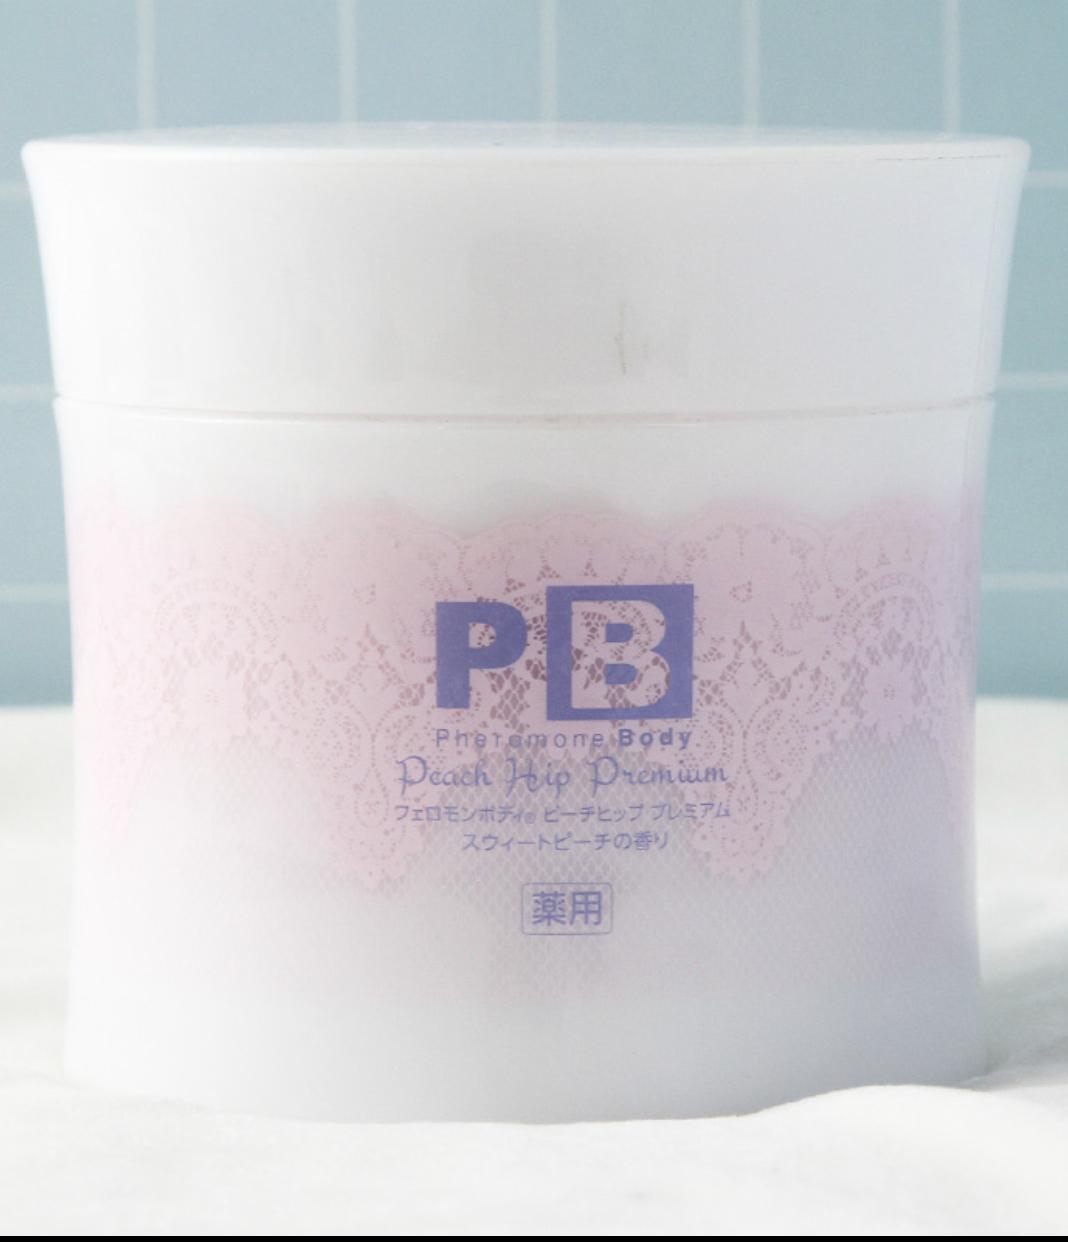 Pheromone Body - Peach Hip Premium, 500g